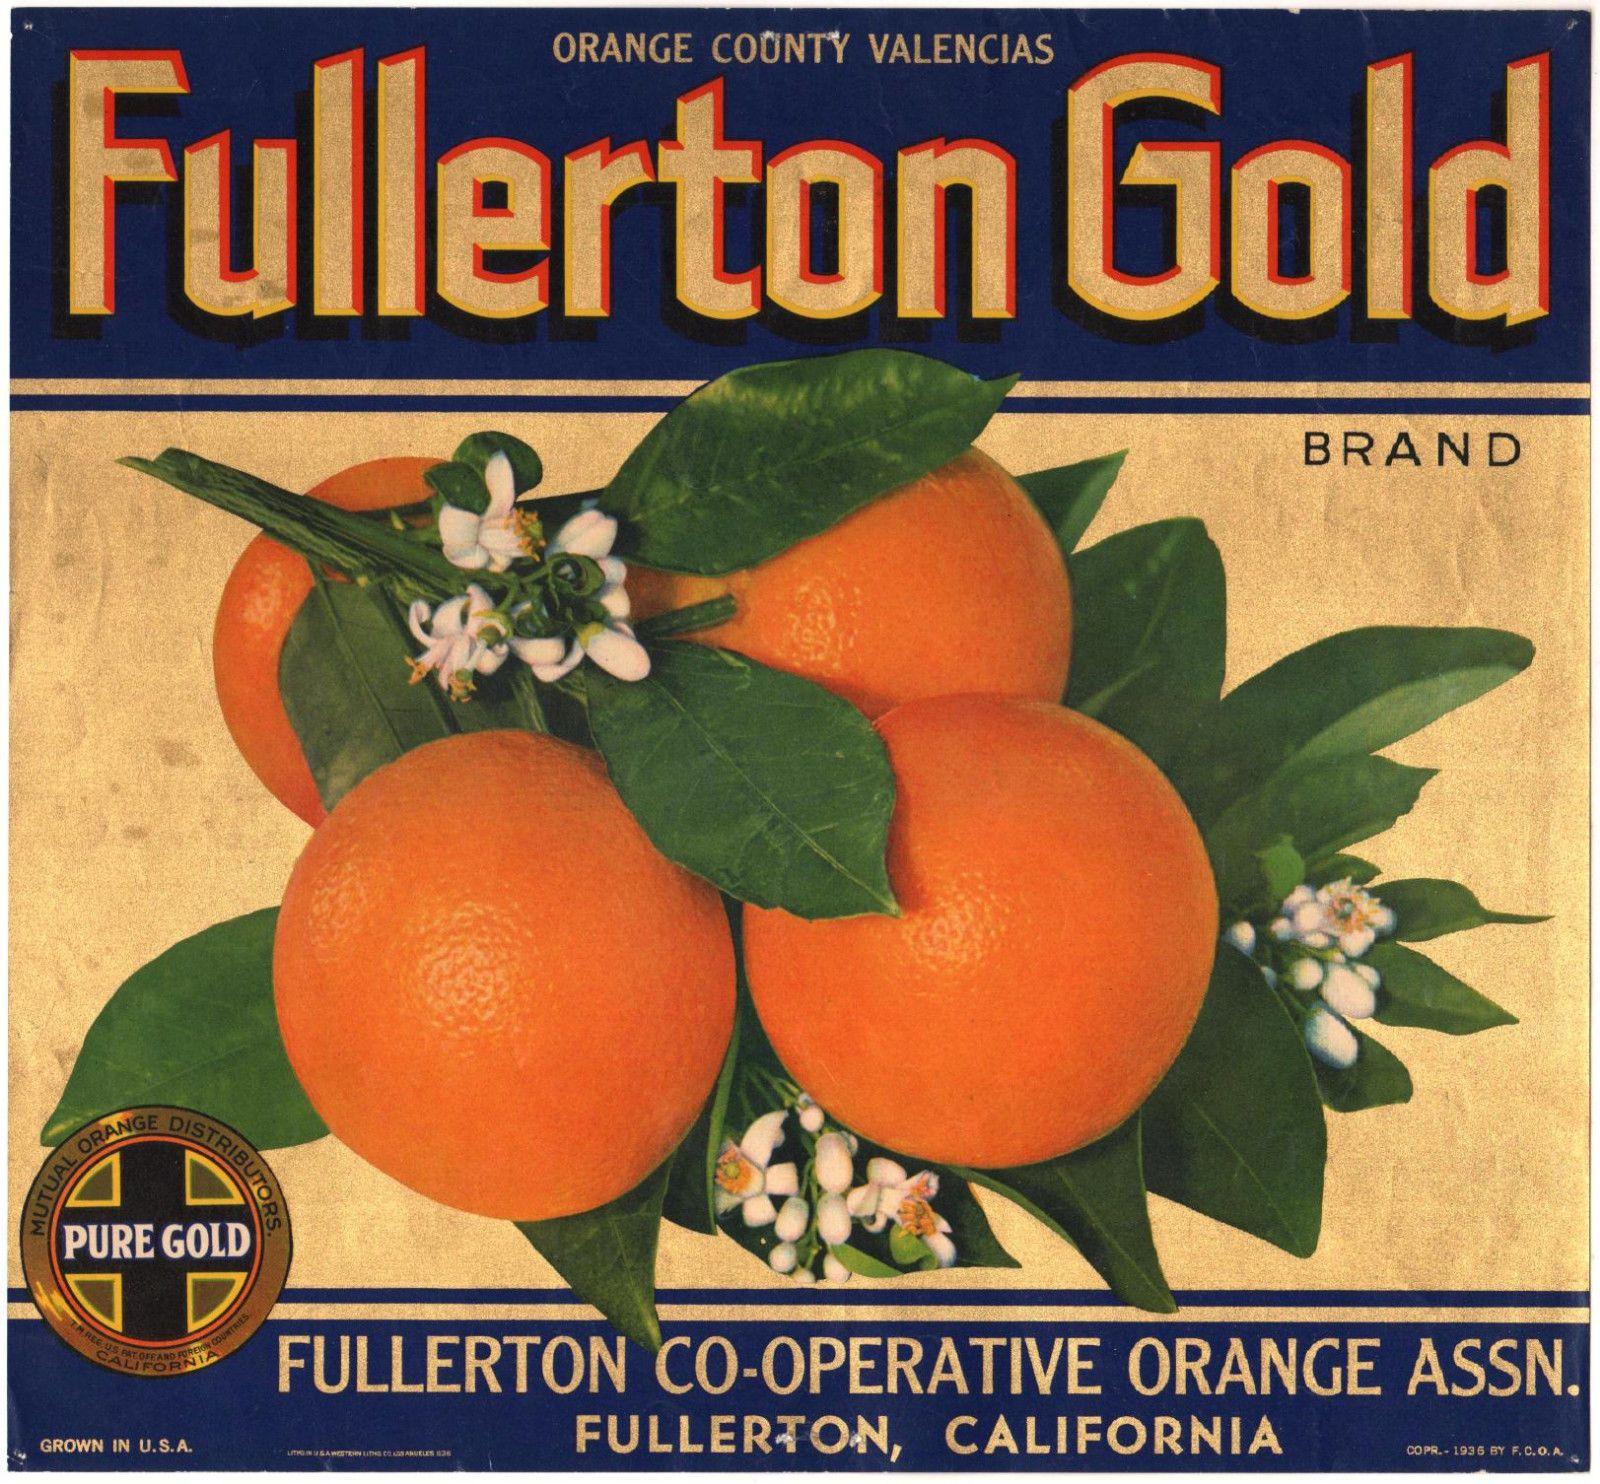 *Original* SHAMROCK Placentia Grove GOOD LUCK Grapefruit Crate Label NOT A COPY!